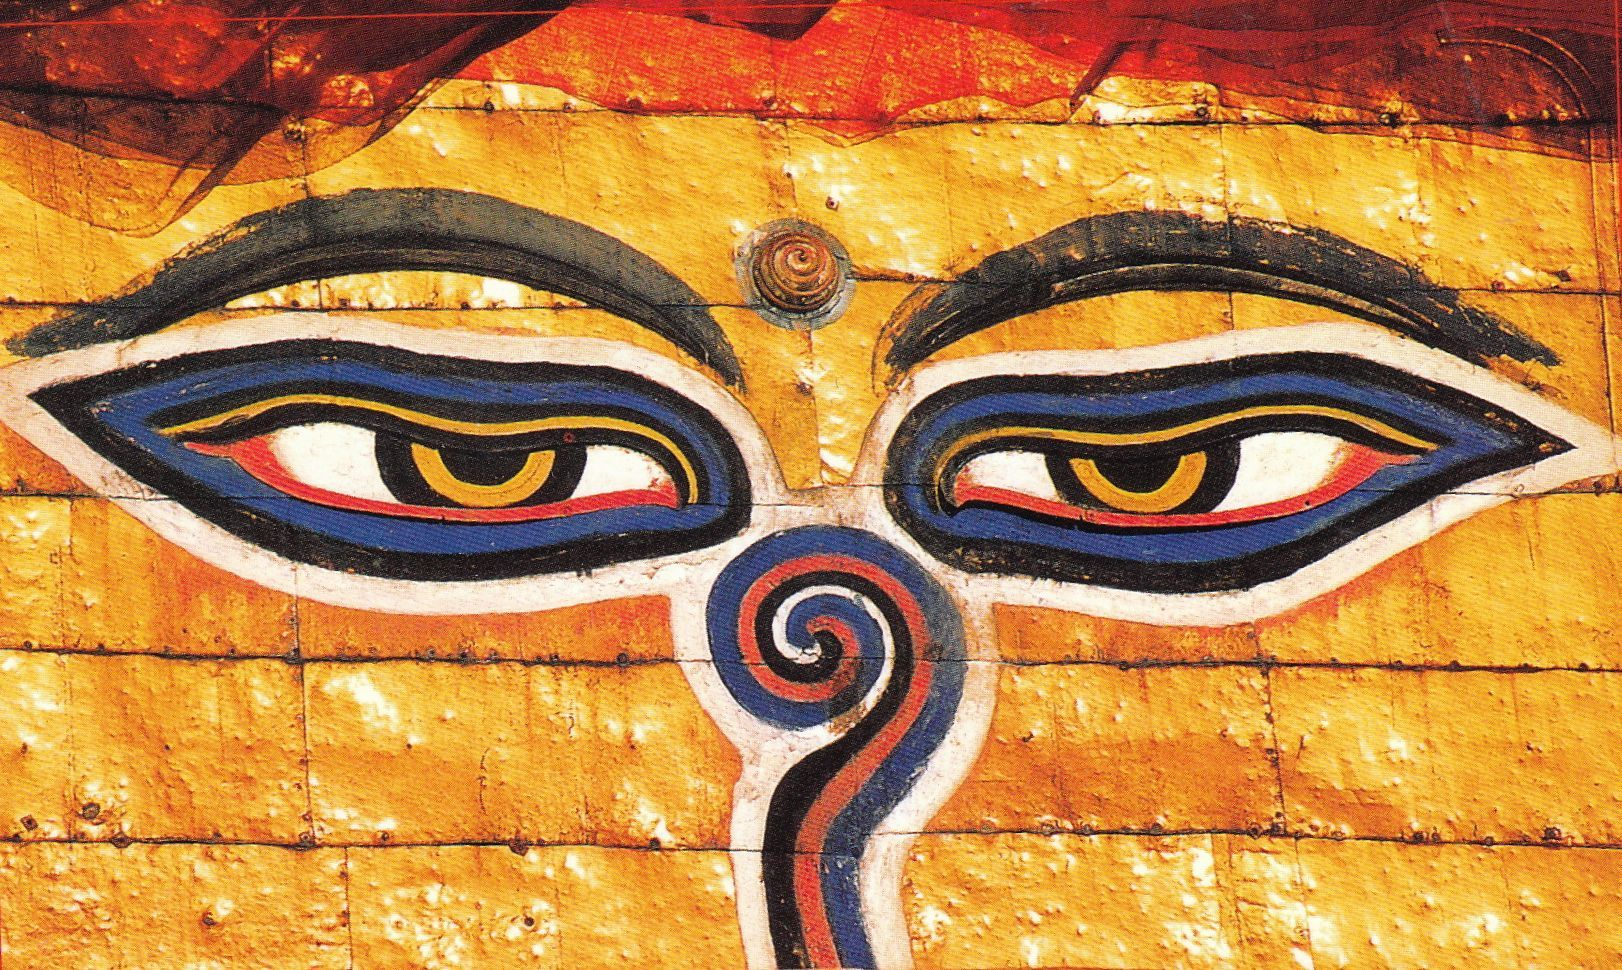 Kathmandu, All-Knowing Eyes